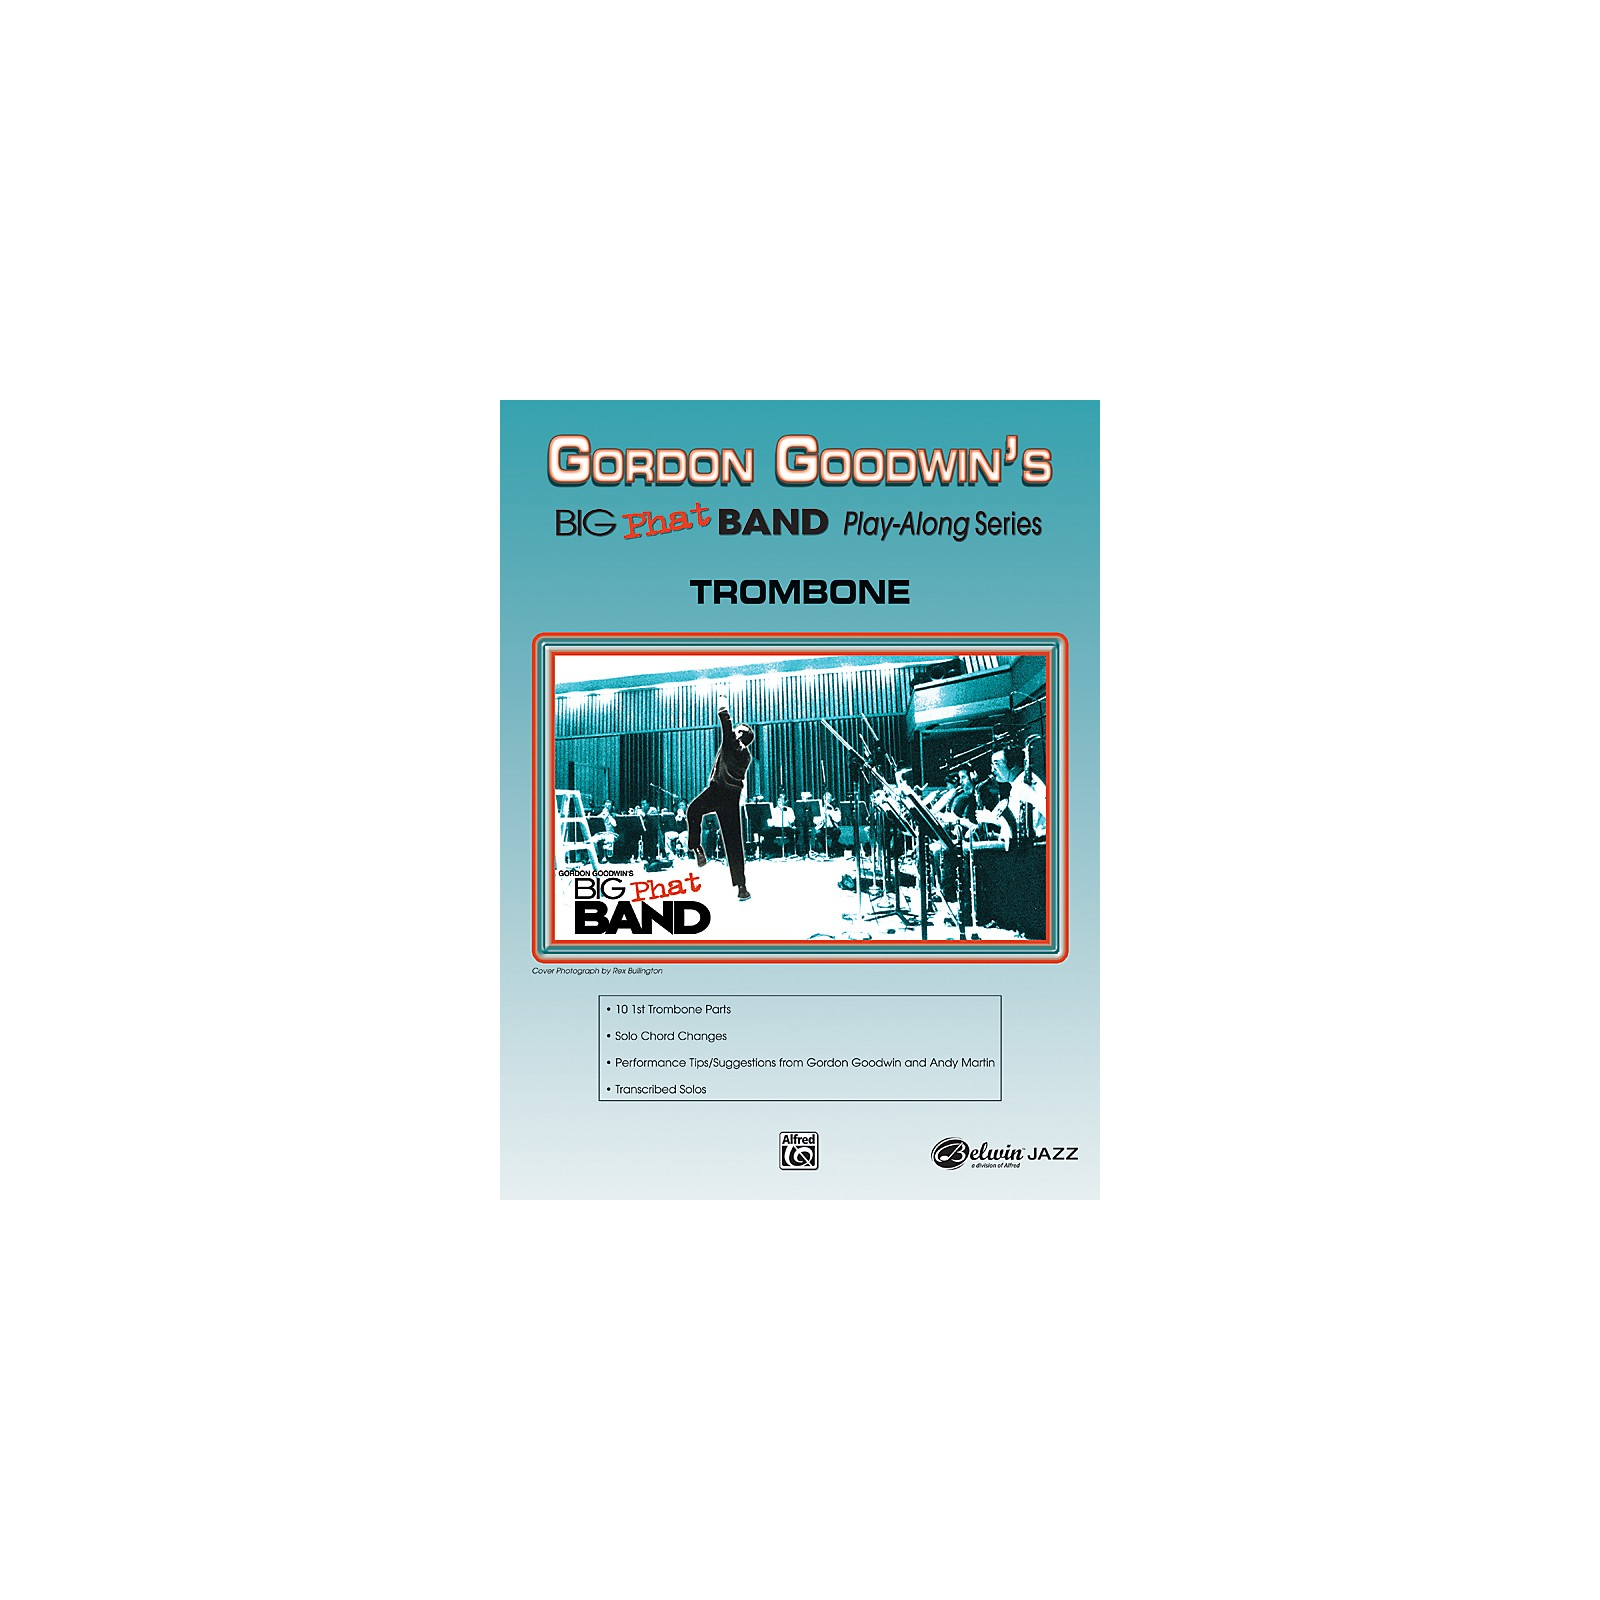 Alfred Gordon Goodwin's Big Phat Band Play Along Series Trombone Songbook & CD